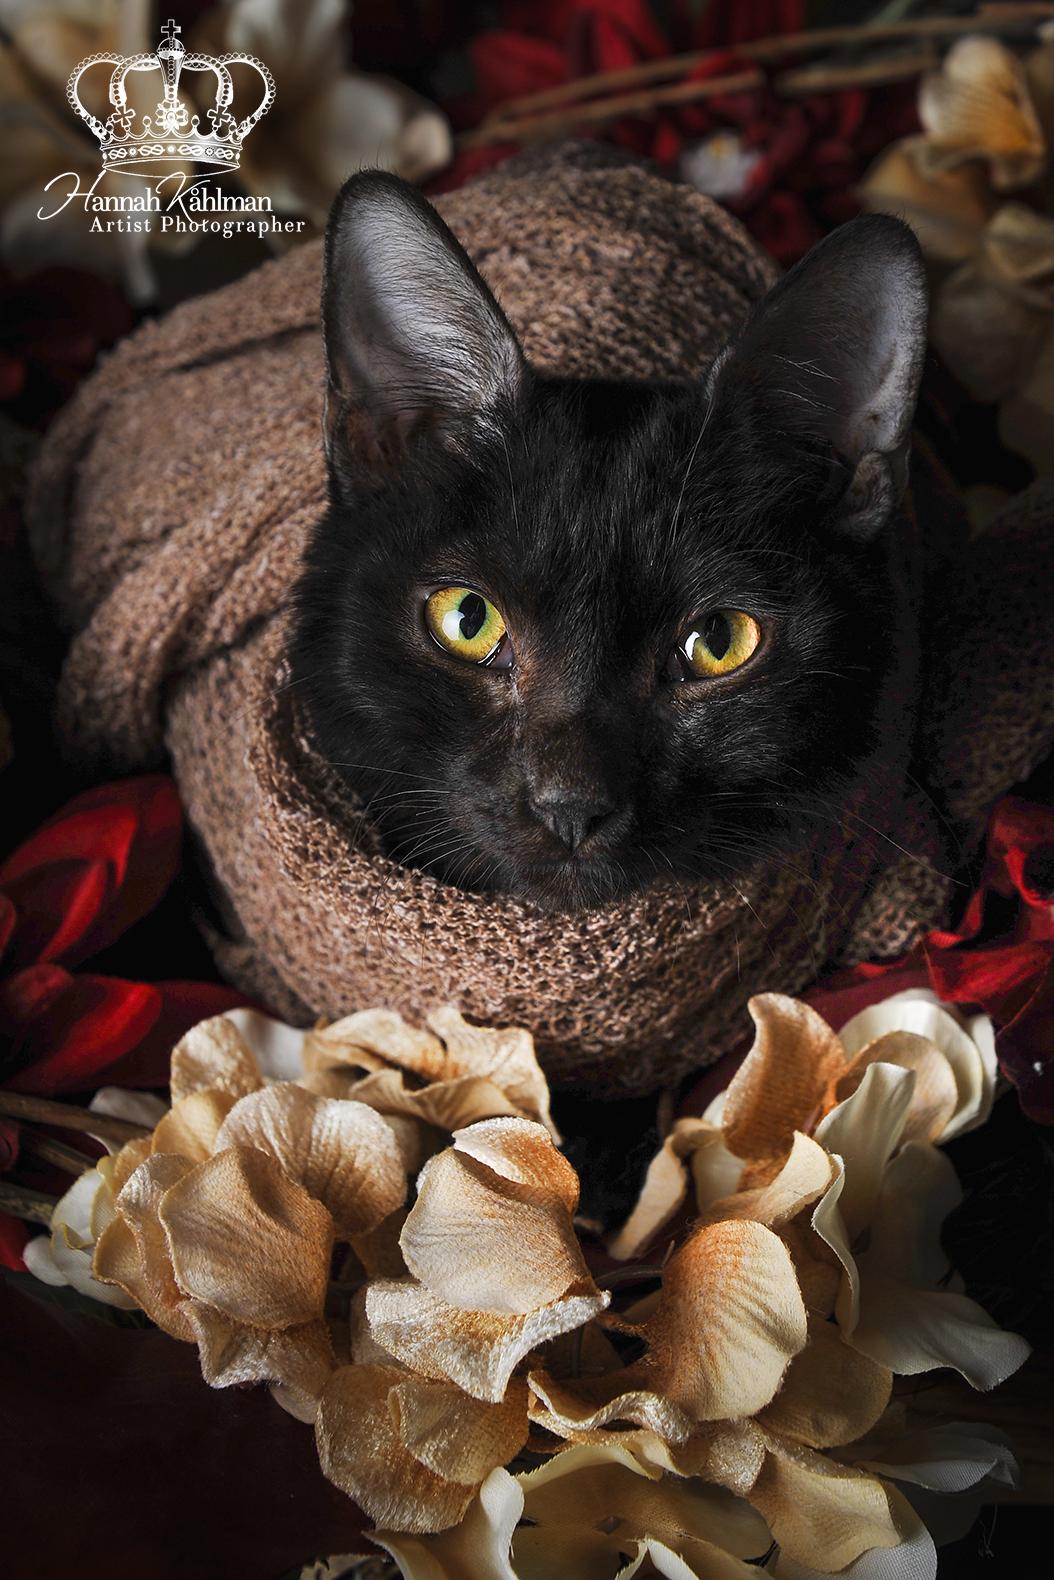 Kitten_dressed_in_flowers_like_newborn_Anchorage_Alaska_pet_photographer_Hannah_Kåhlman_Artist_Photo